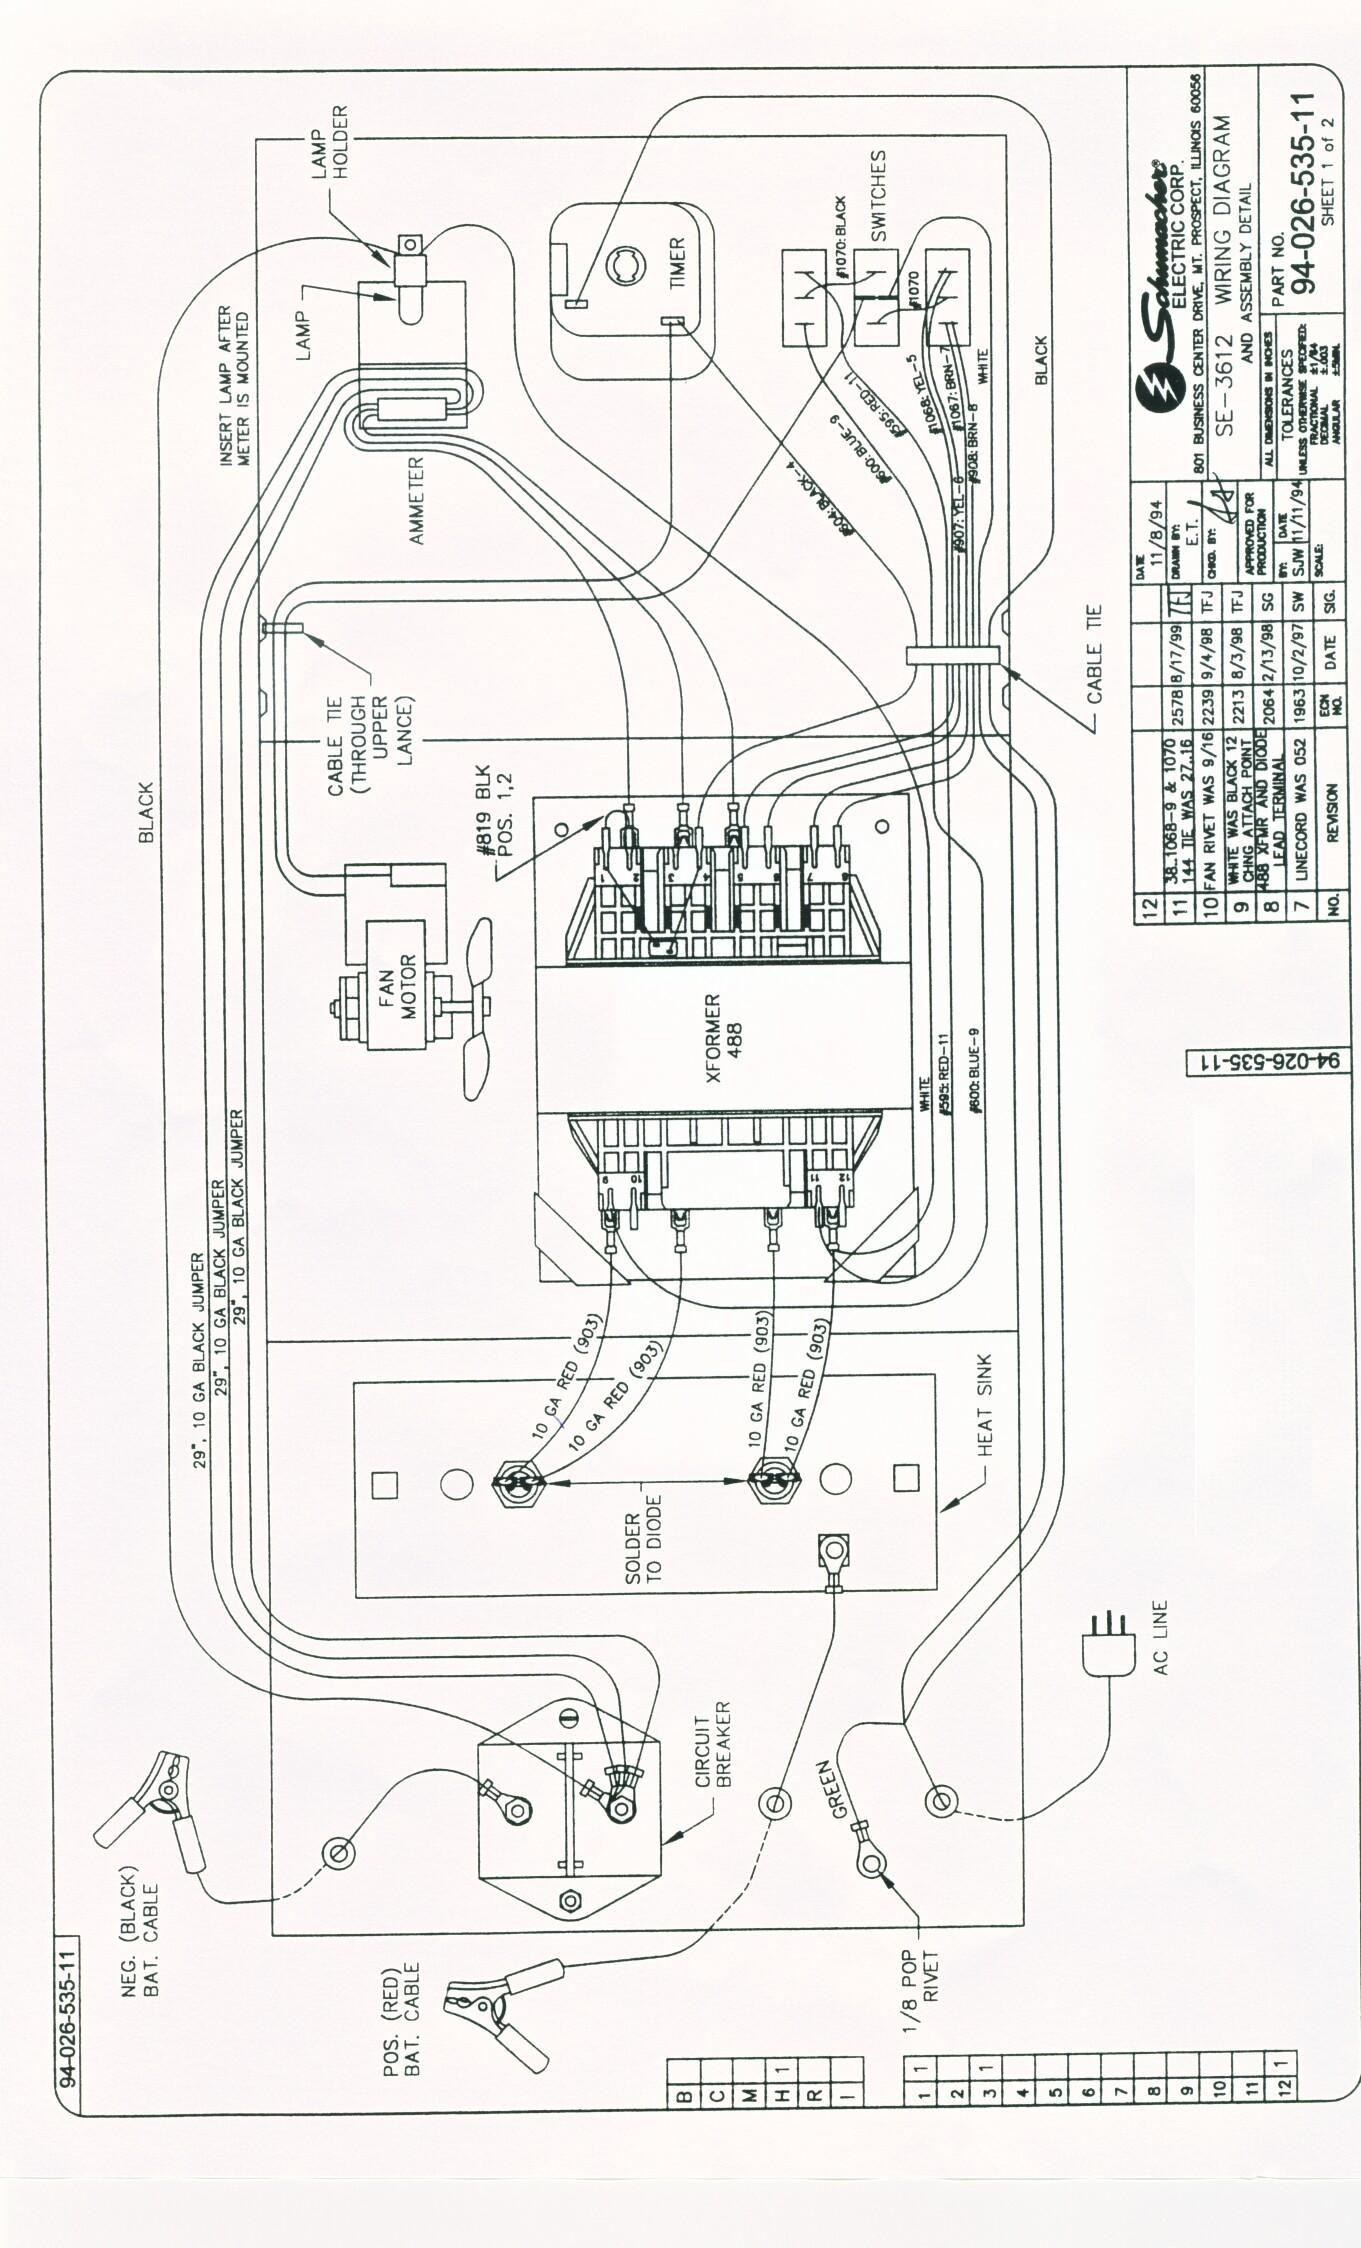 Peachy Marine Charger Wiring Diagram Wiring Diagram Database Wiring Cloud Waroletkolfr09Org